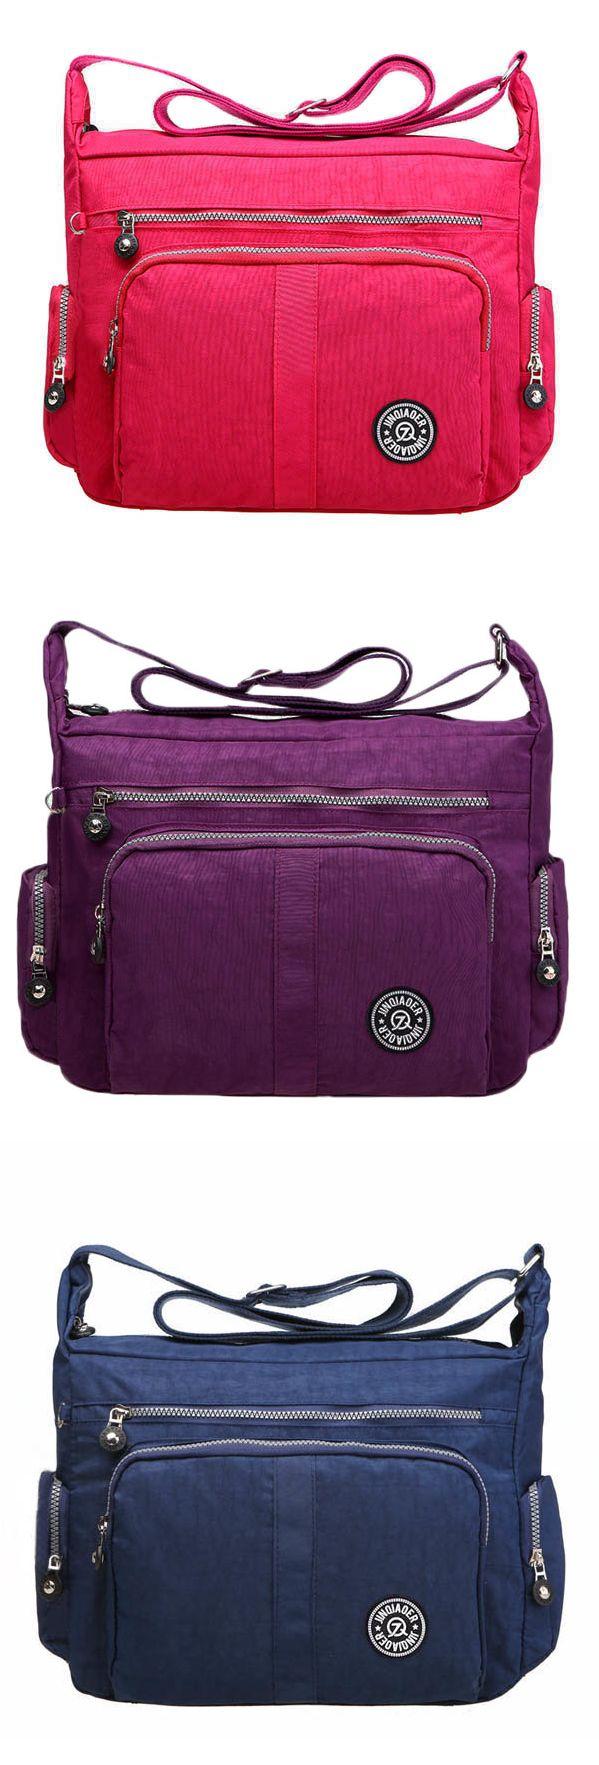 ea4d655e392 Women Nylon Waterproof Multi-pocket Zipper Shoulder Bags Crossbody Bags